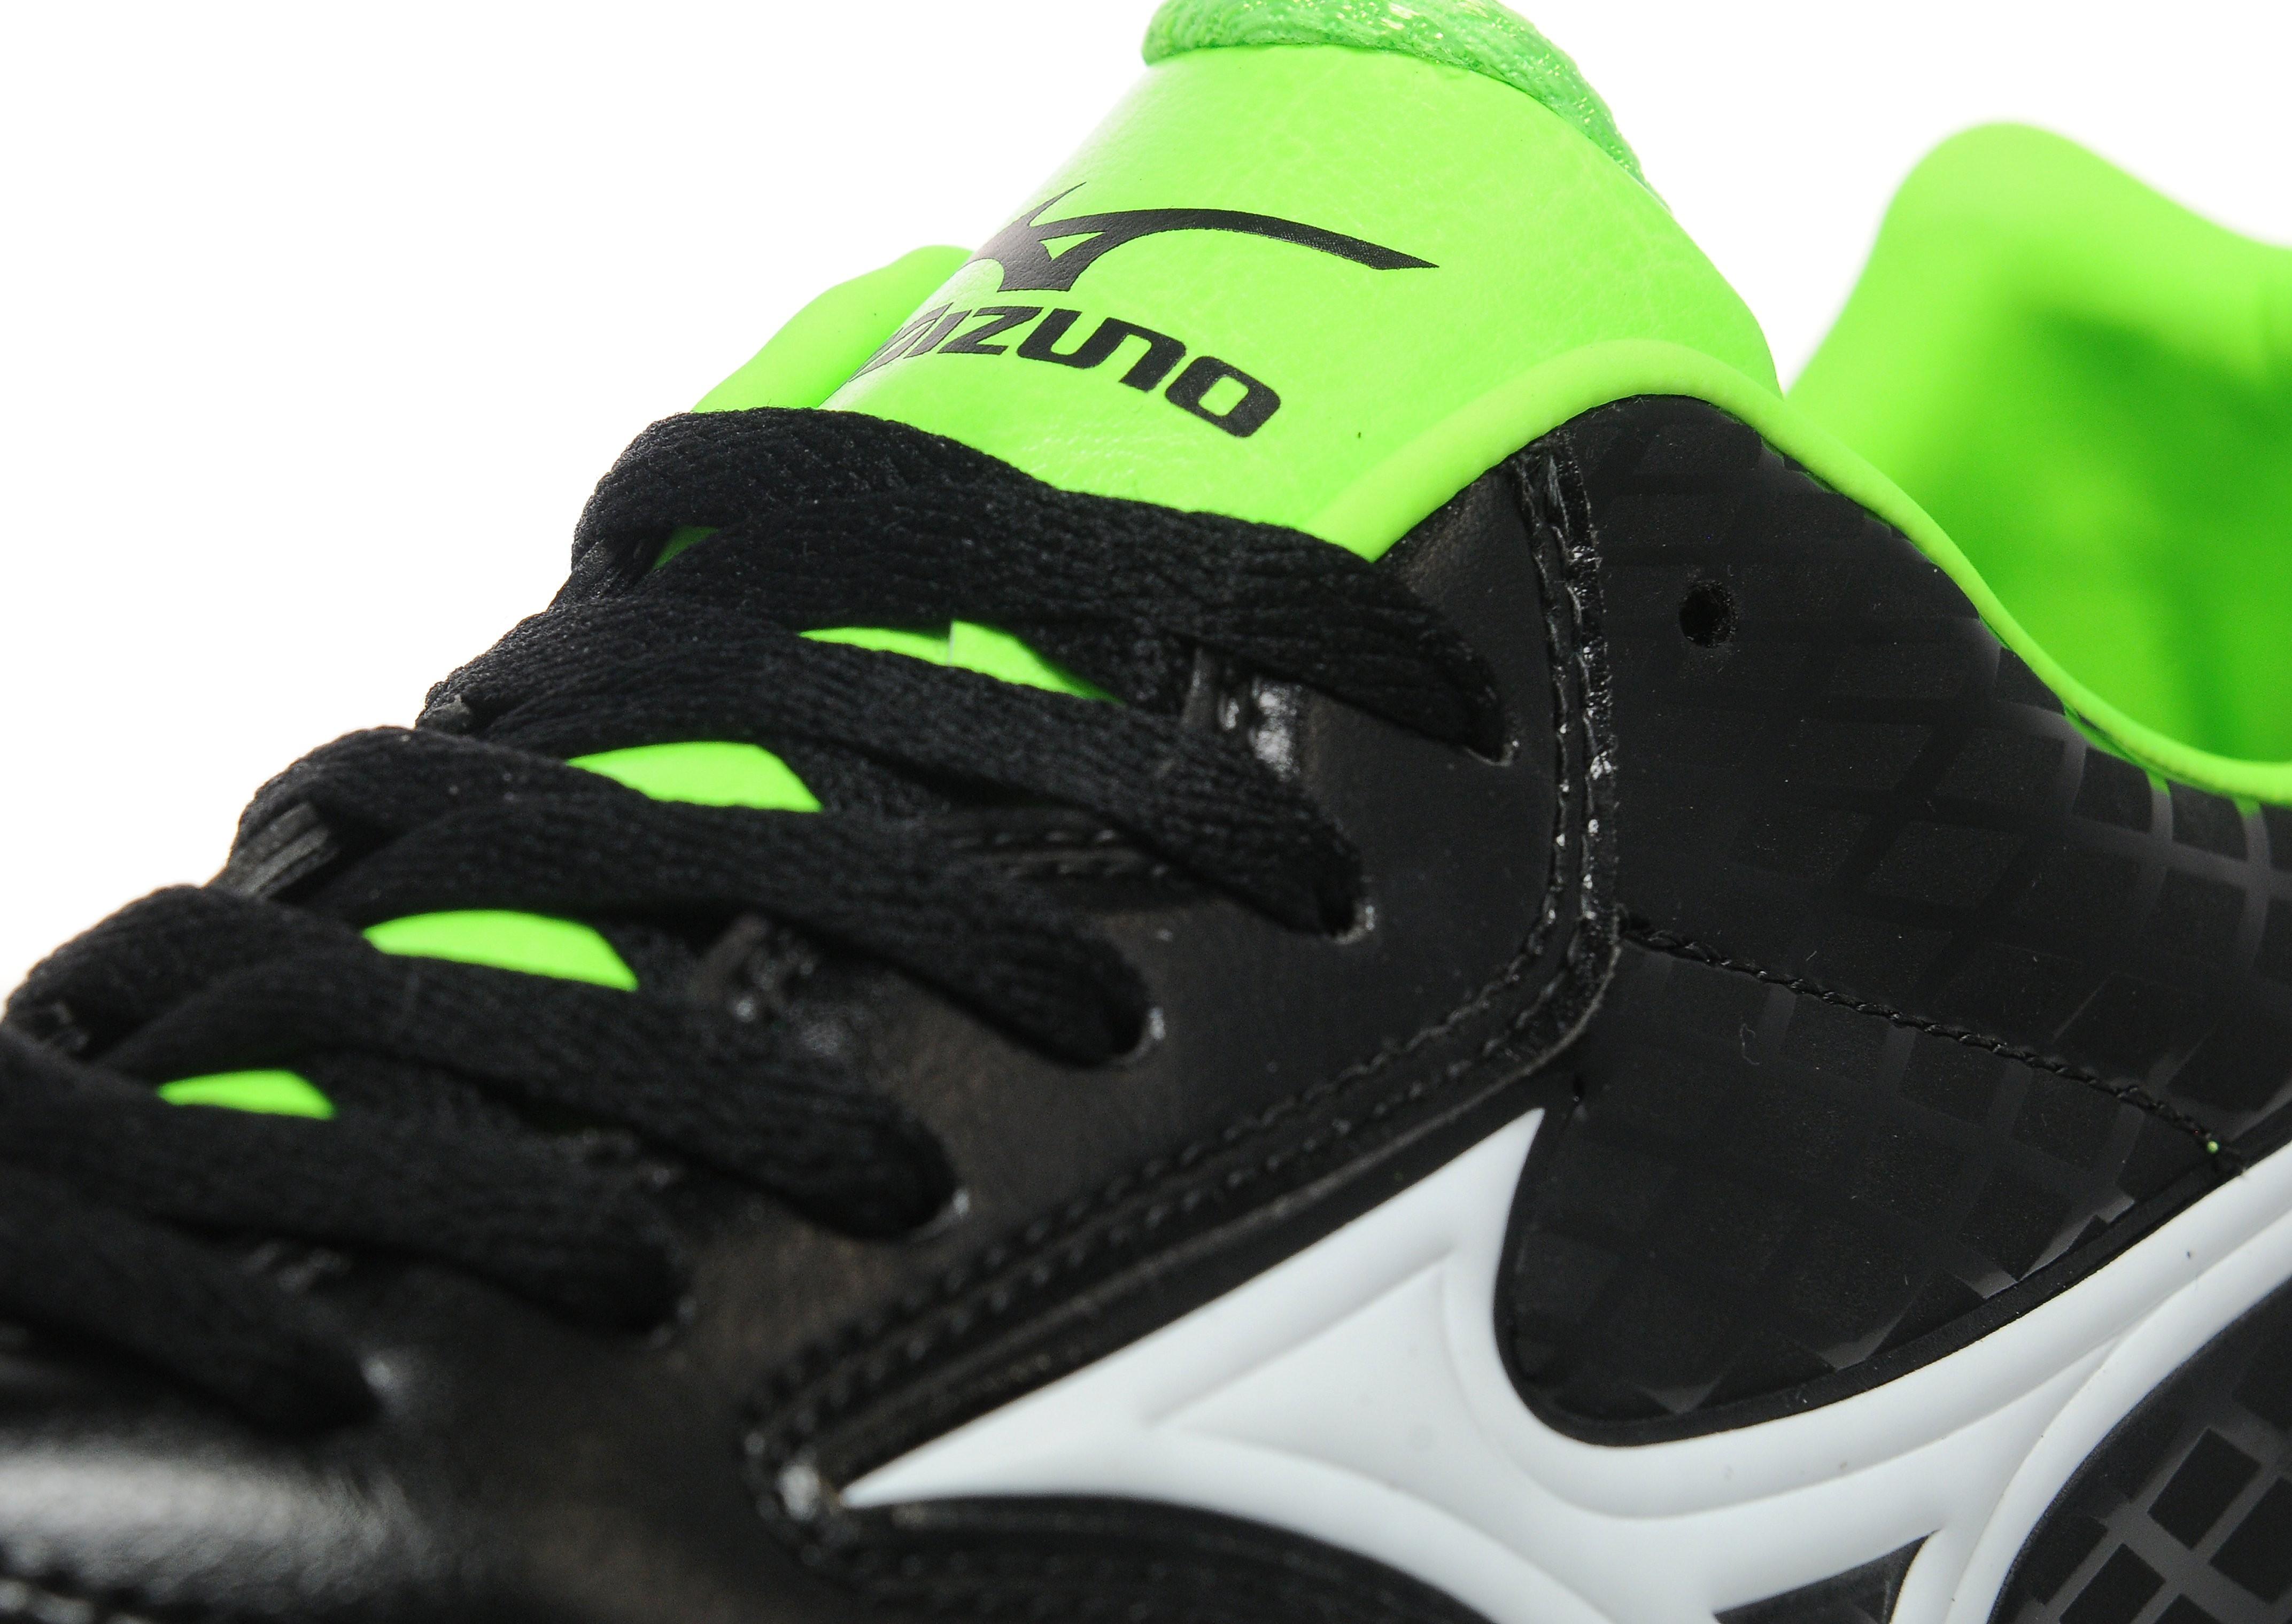 Mizuno Waitangi PS Rugby Boots